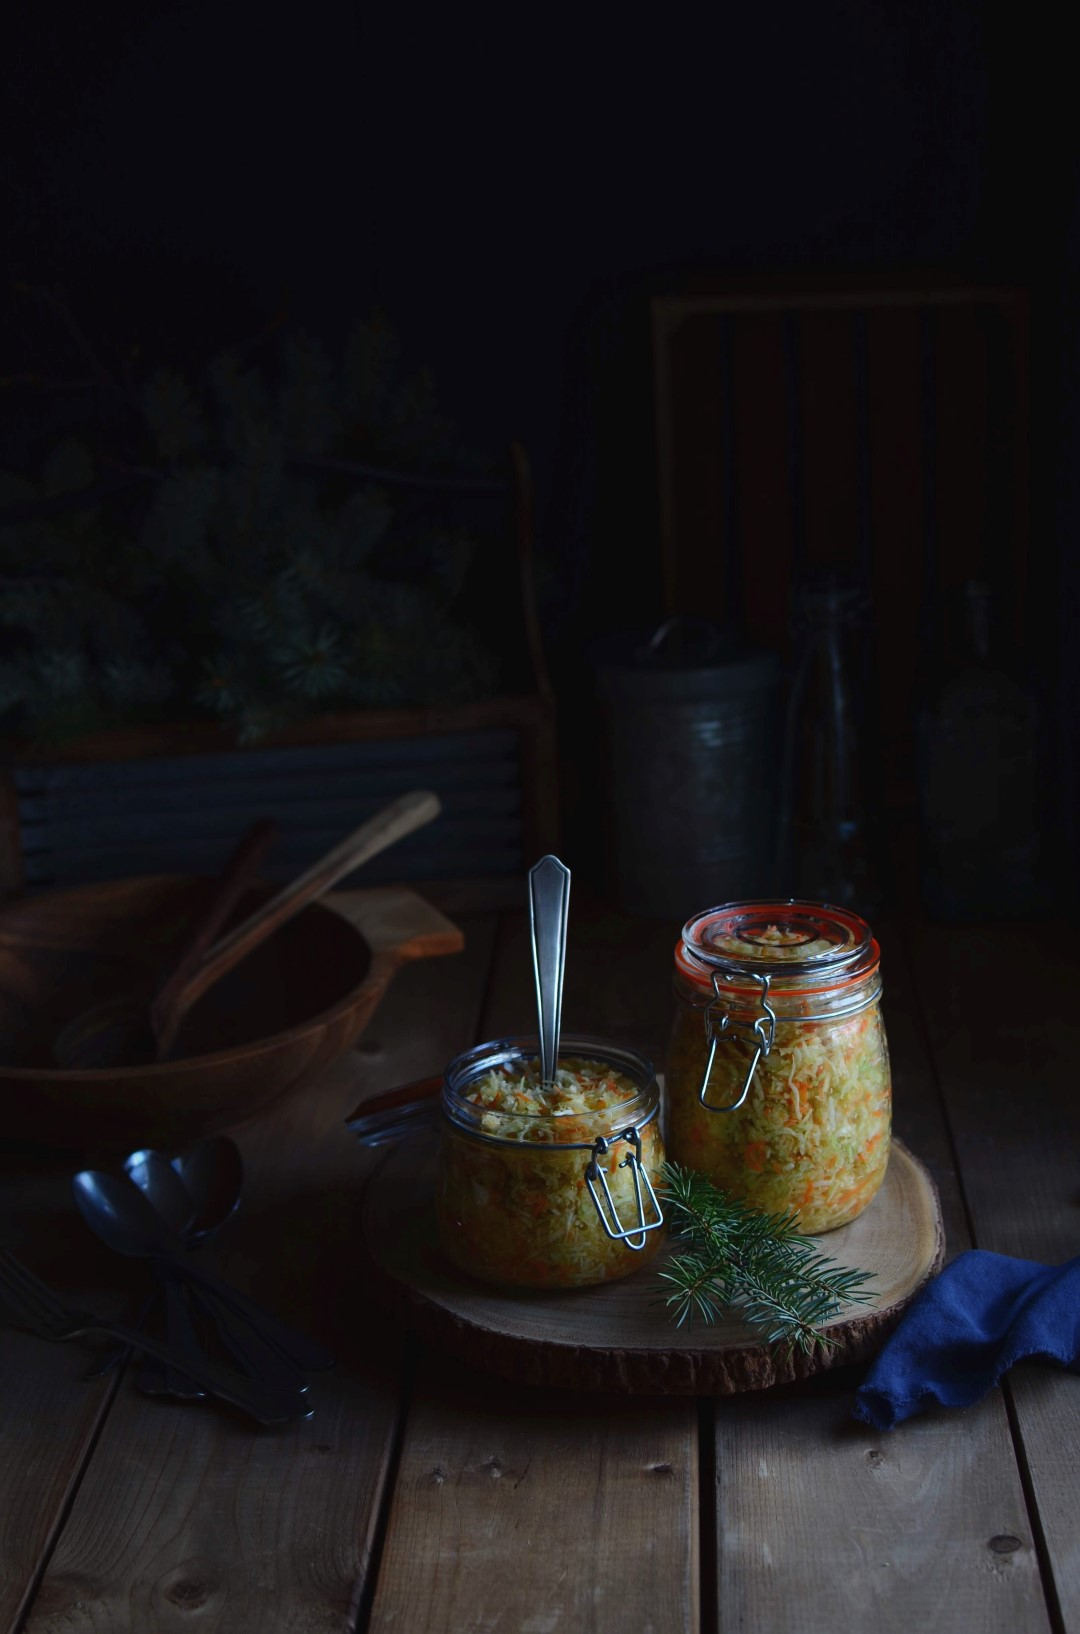 classic coleslaw | conifères & feuillus